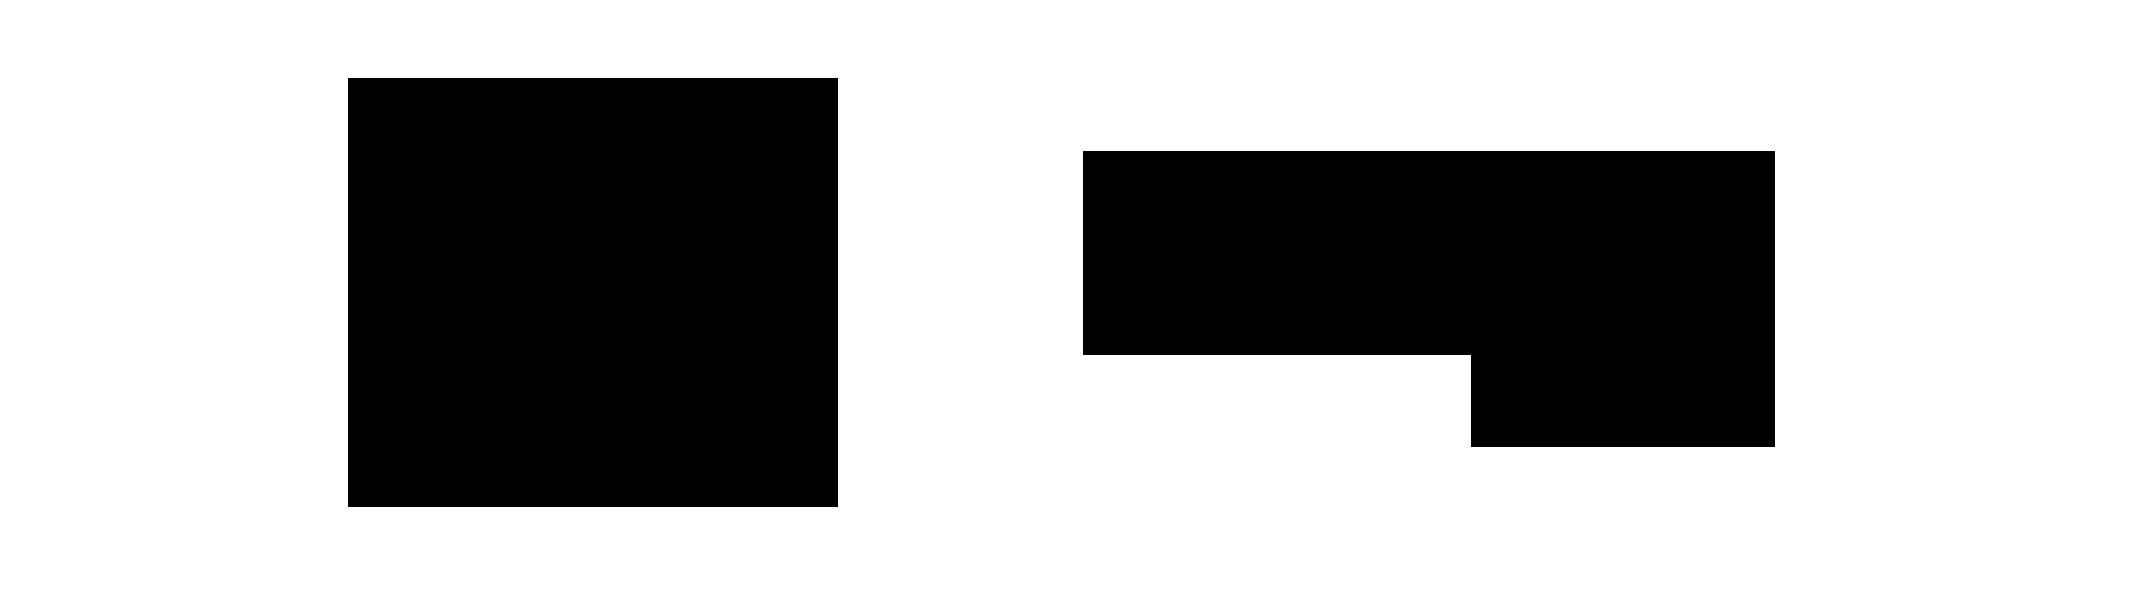 mellywells_bullboat_logo.png